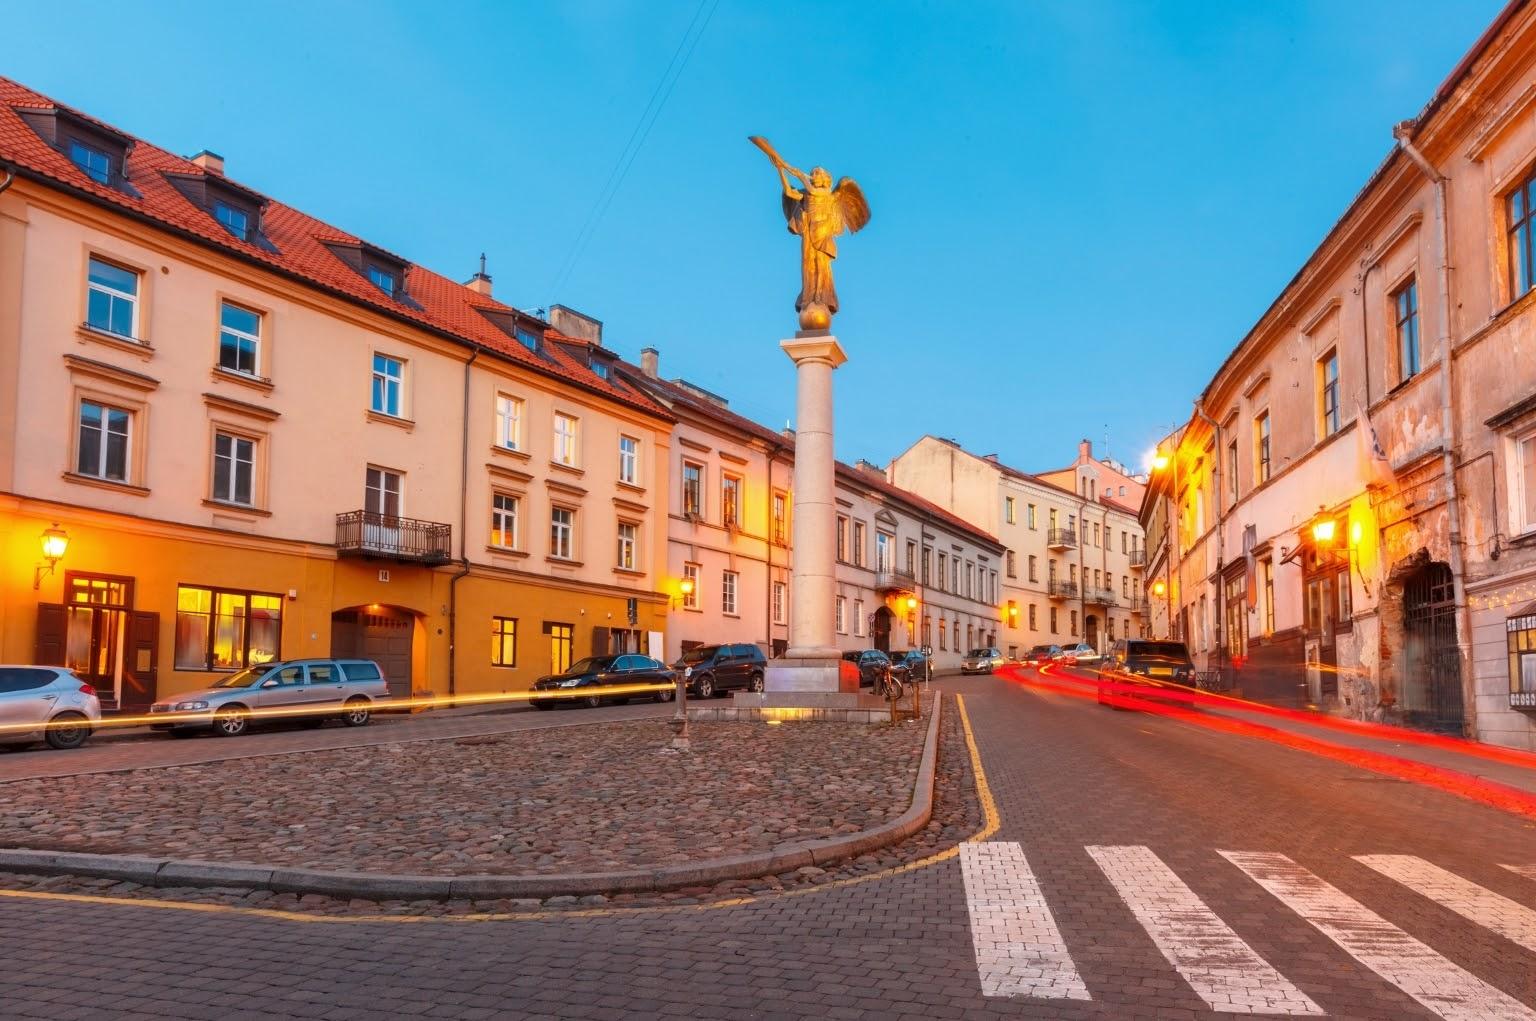 Uzupis Angel in the main square